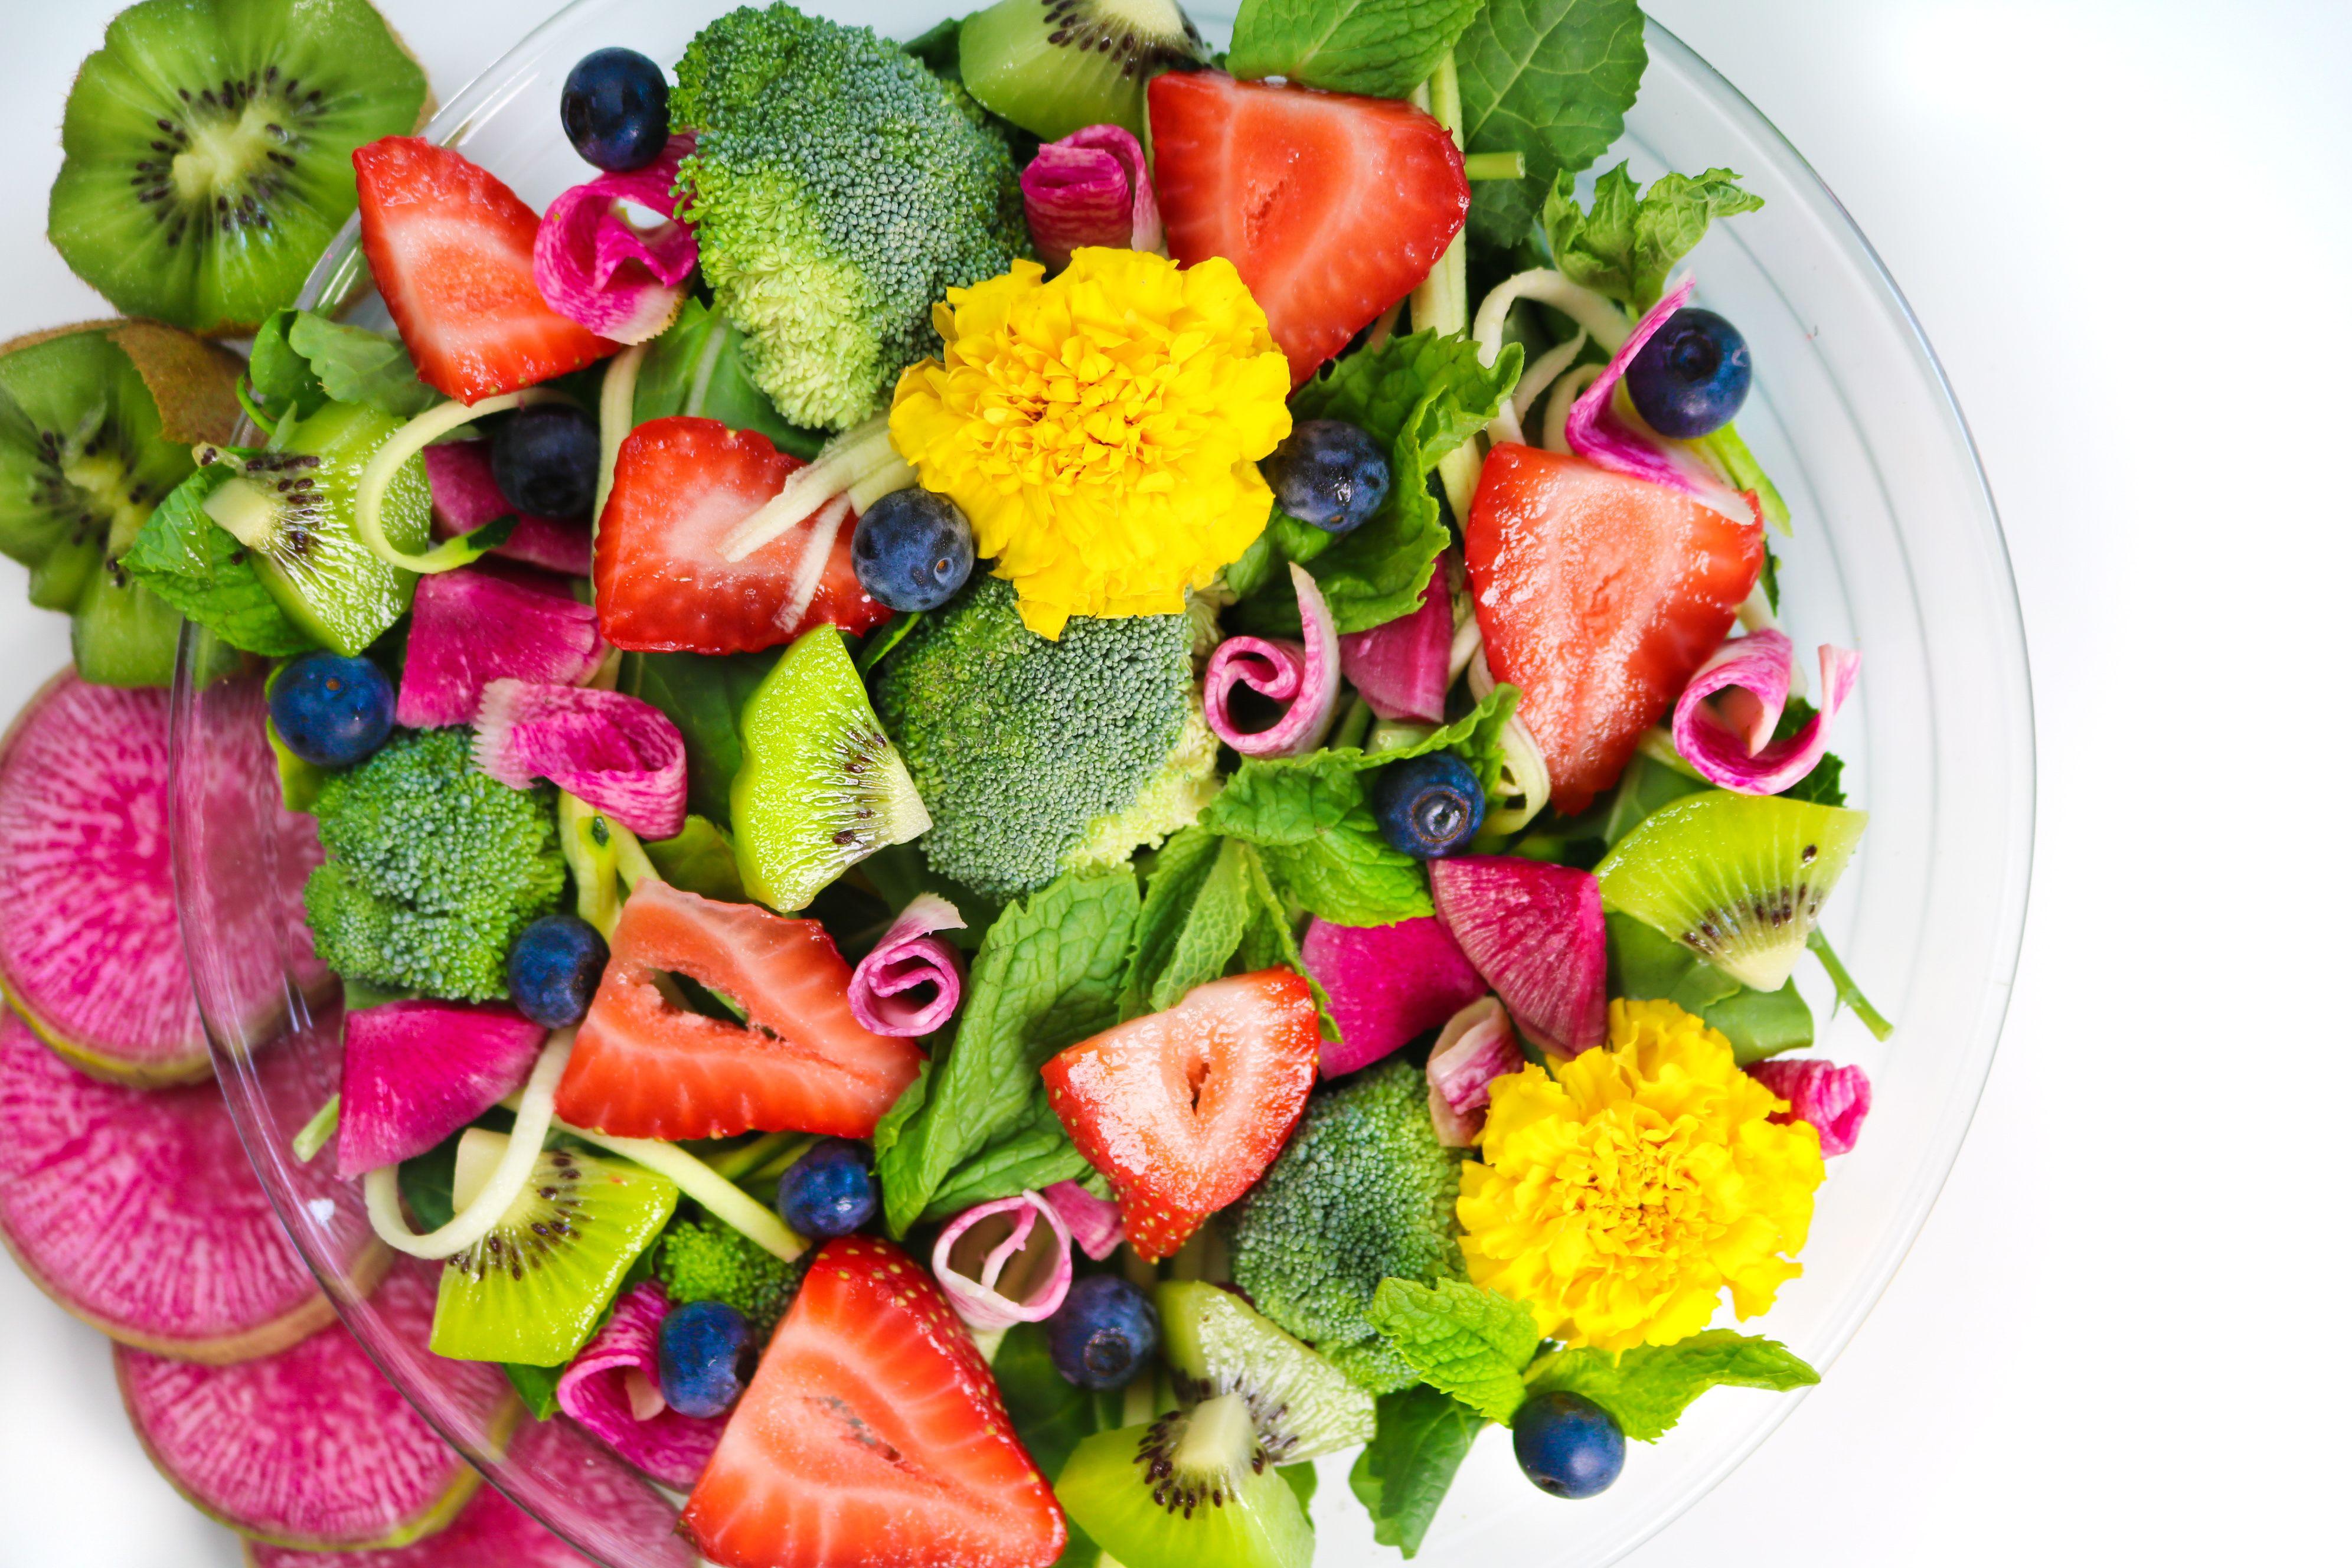 Summery Strawberry Kiwi Salad Dressing. livingwholesarahdavis.com